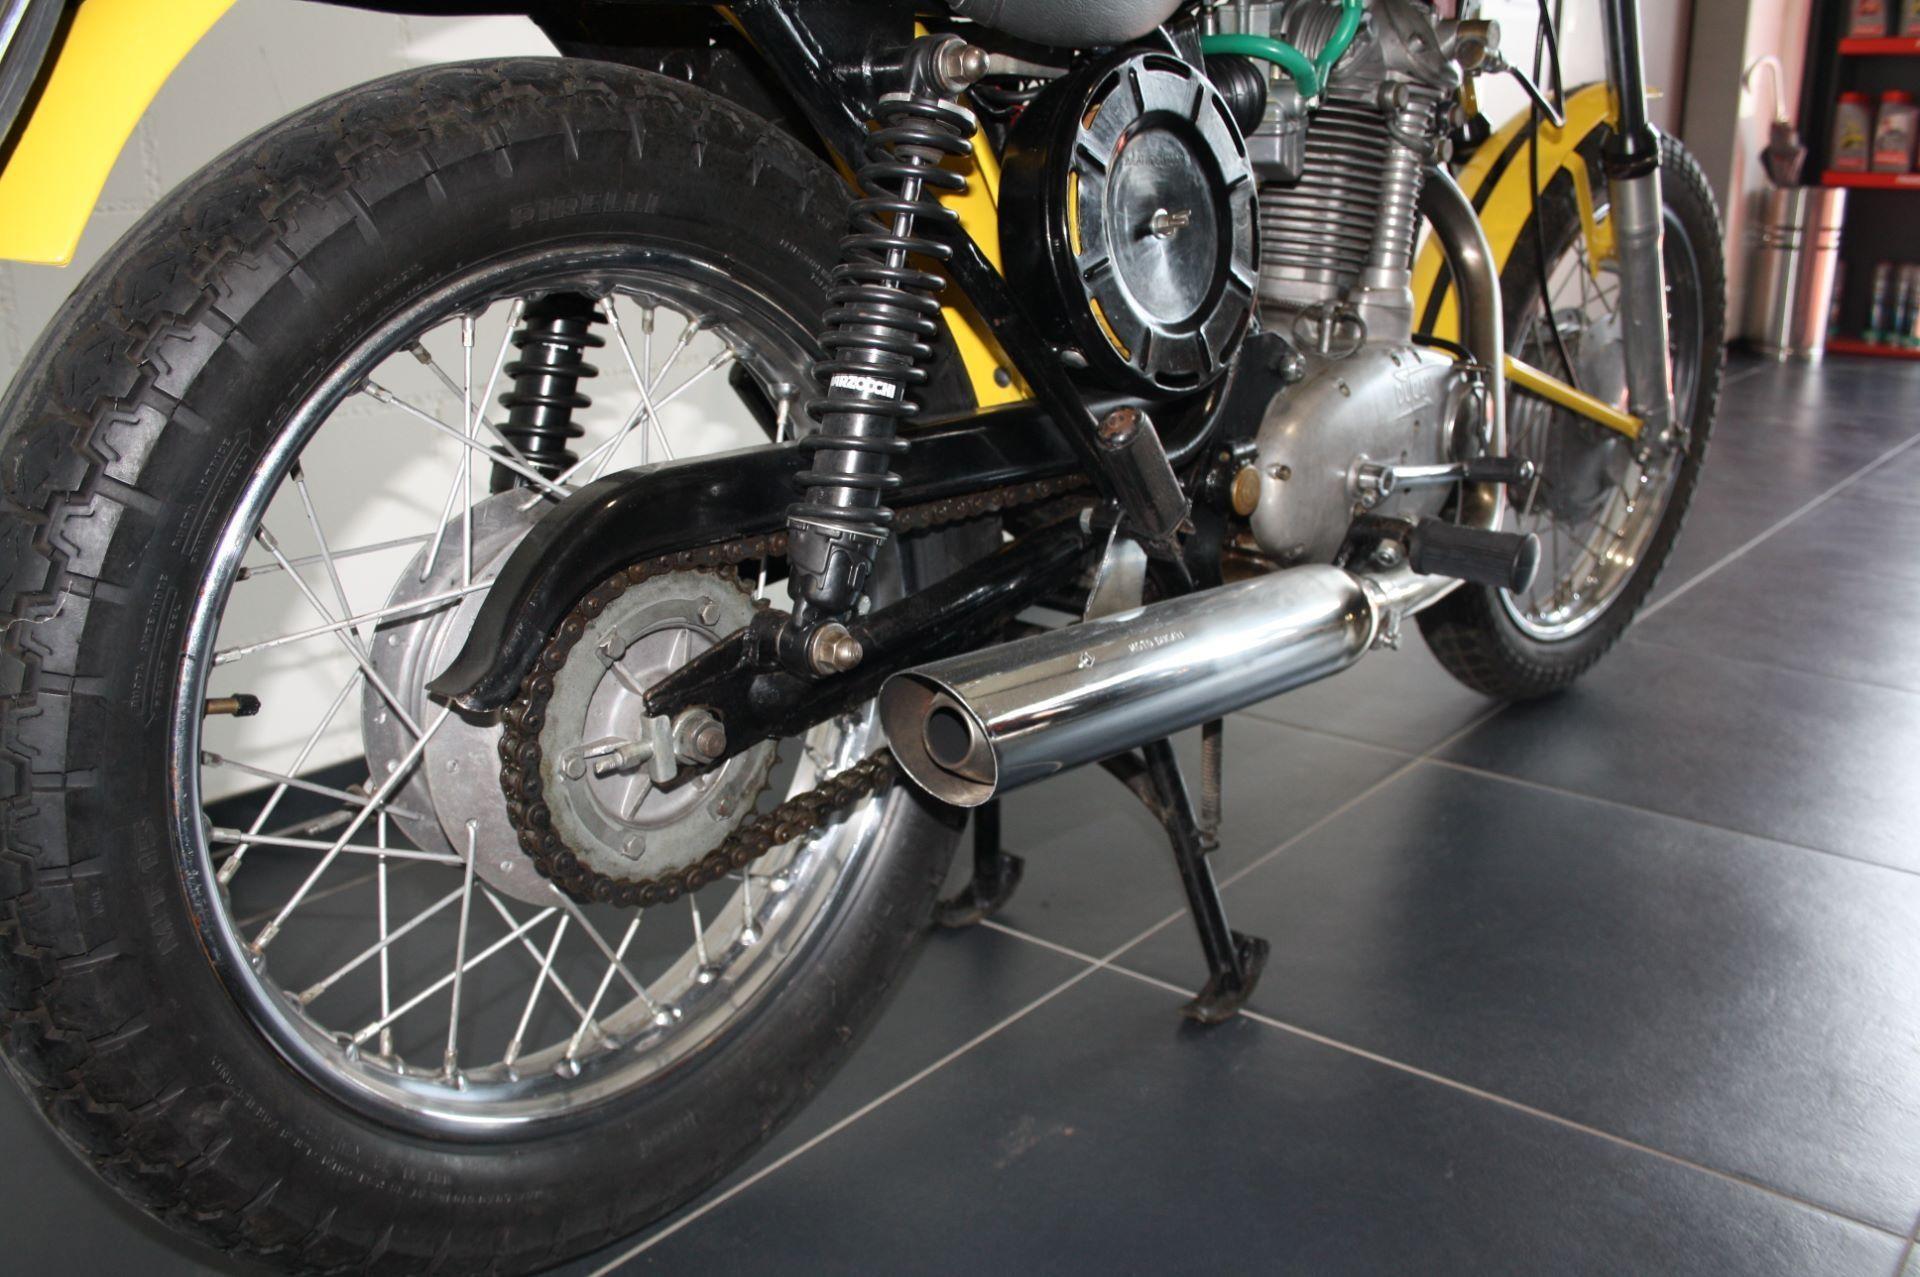 motorrad occasion kaufen ducati spezial dm 450 s moto. Black Bedroom Furniture Sets. Home Design Ideas